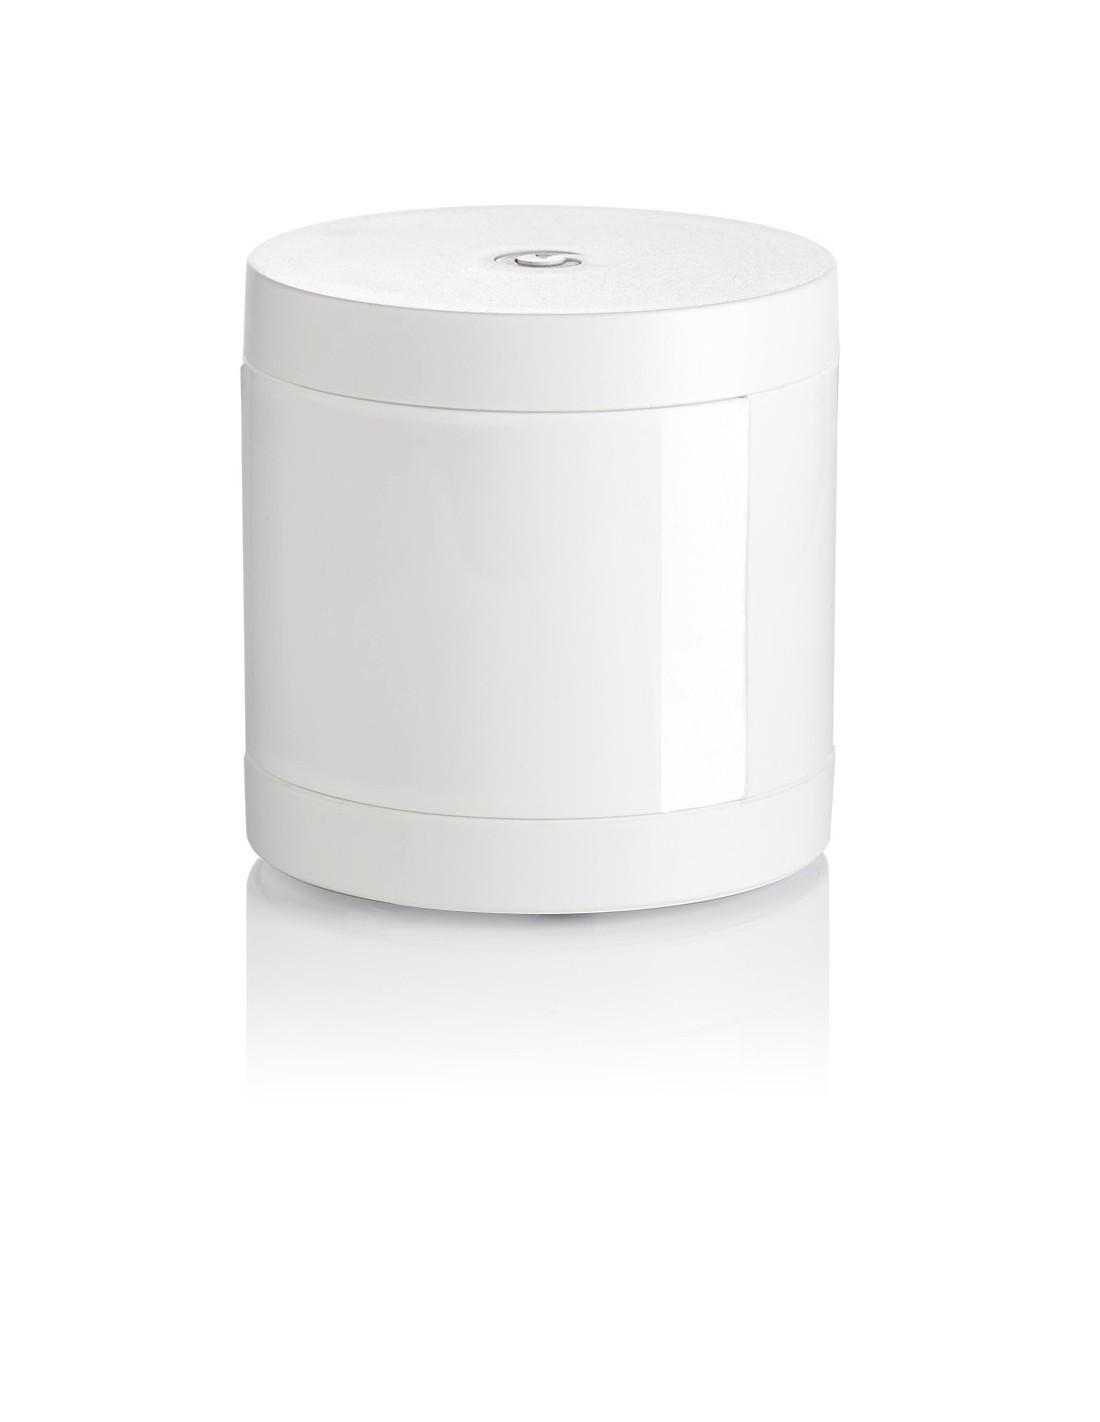 myfox motion sensor for myfox home alarm. Black Bedroom Furniture Sets. Home Design Ideas